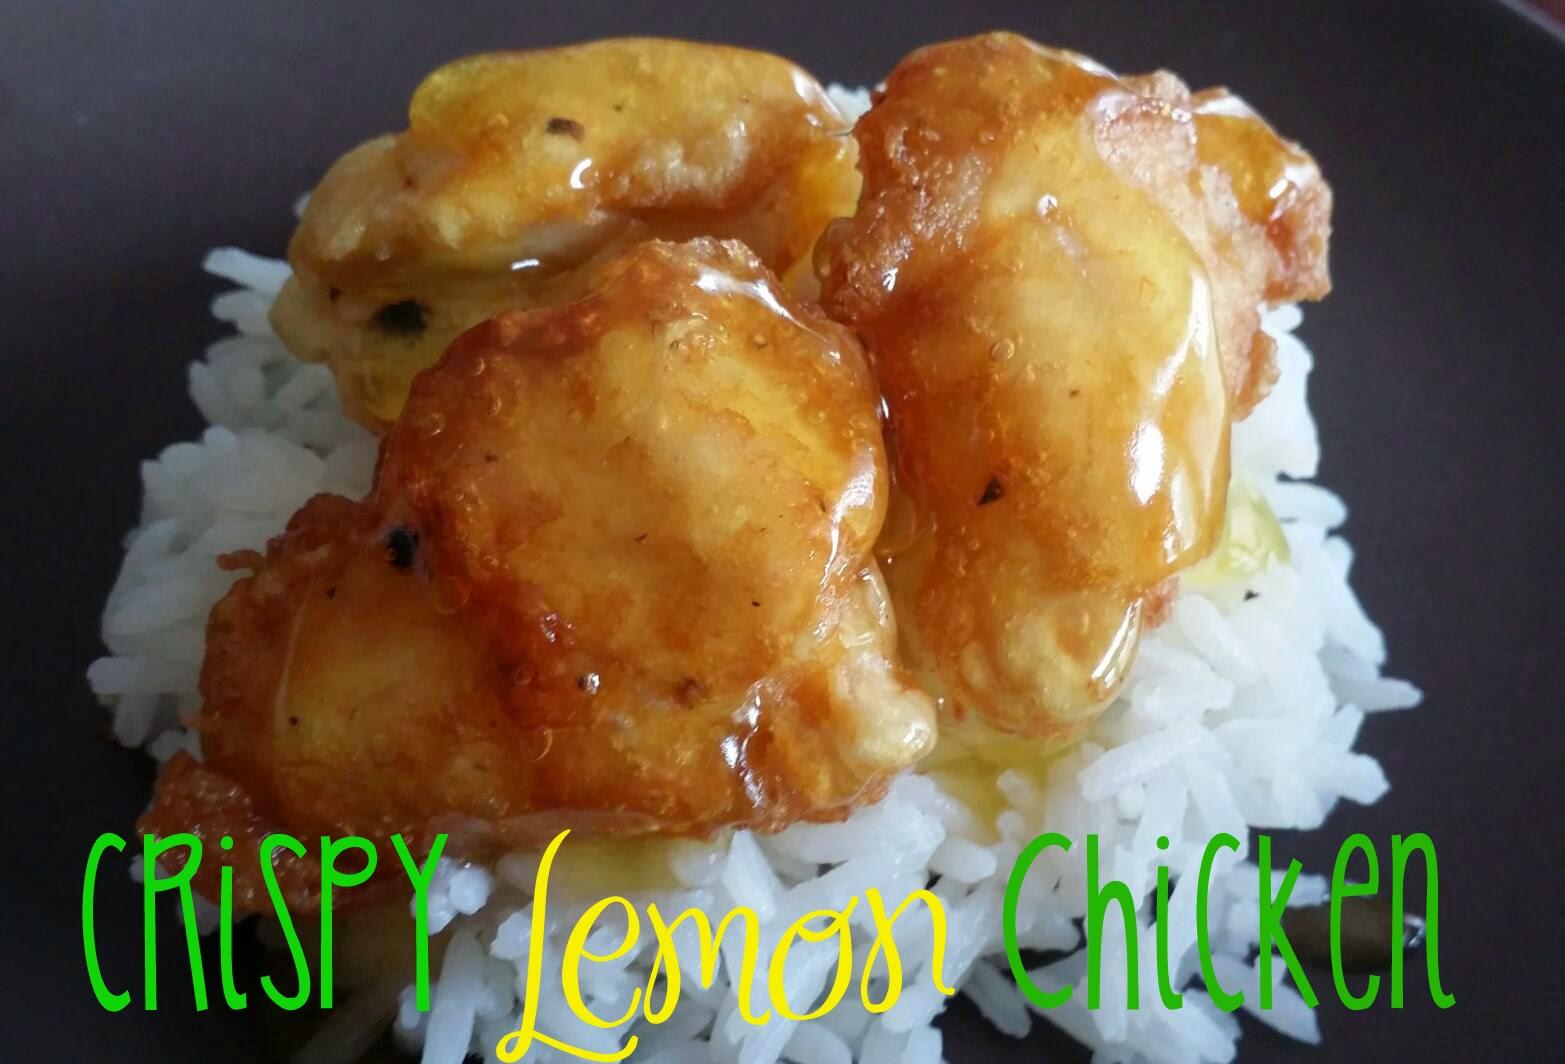 My Favorite Things: Crispy Lemon Chicken